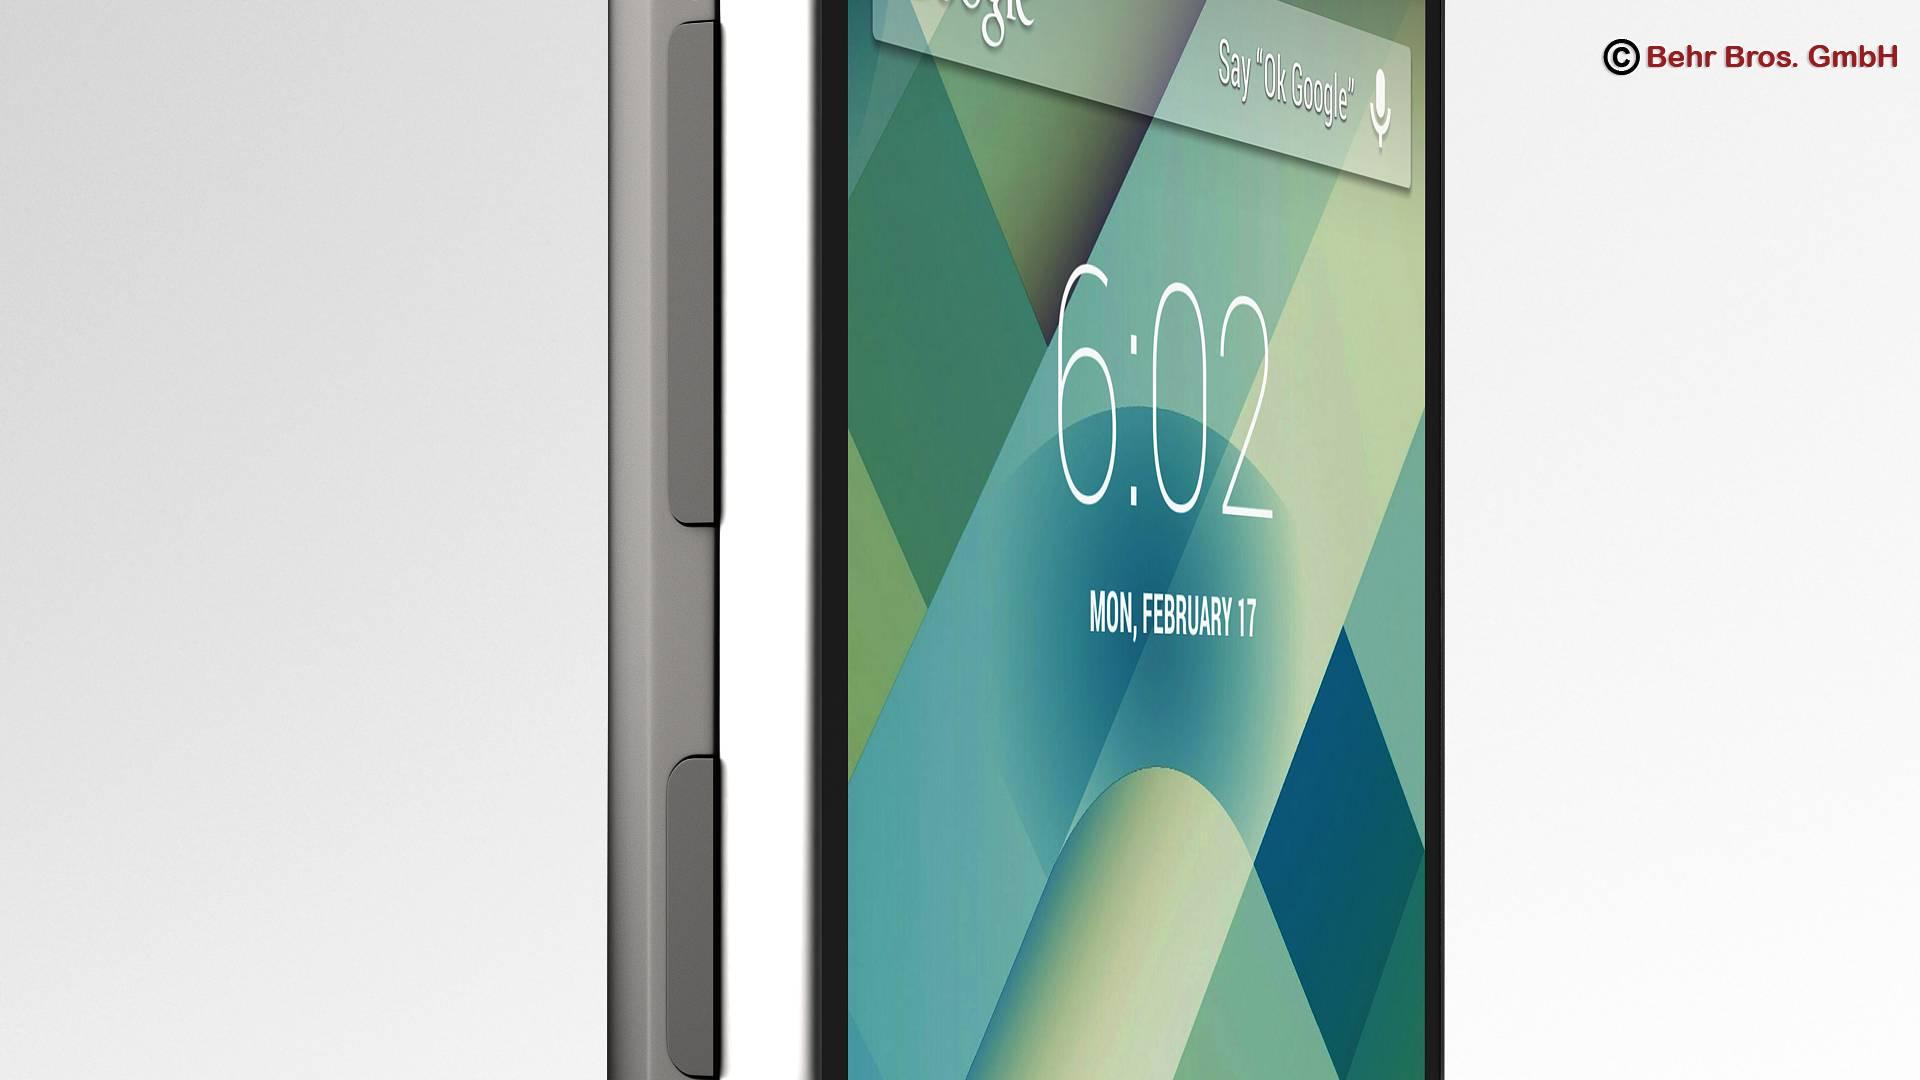 generic smartphone 4 inch 3d model 3ds max fbx c4d lwo ma mb obj 161627